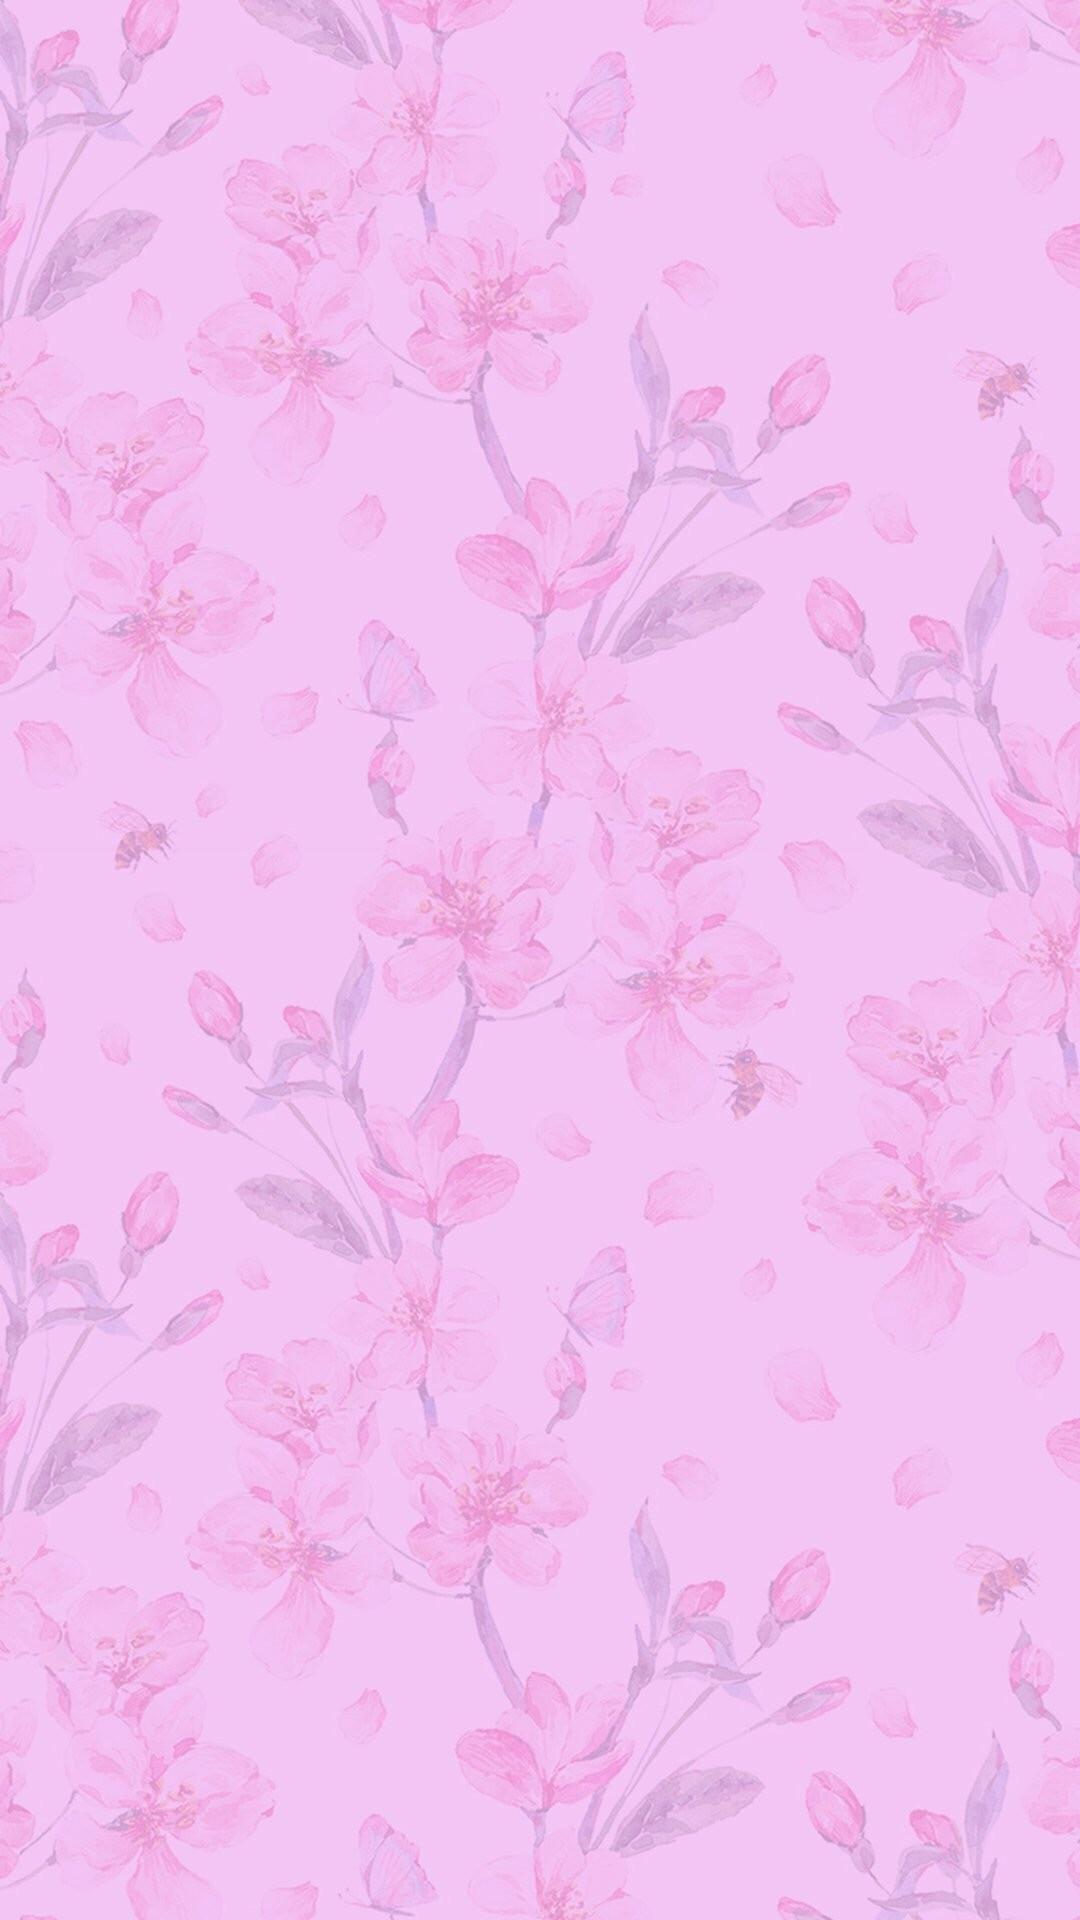 Pink Wallpaper, Smartphone, Pastel, Girly, Walls, Wall